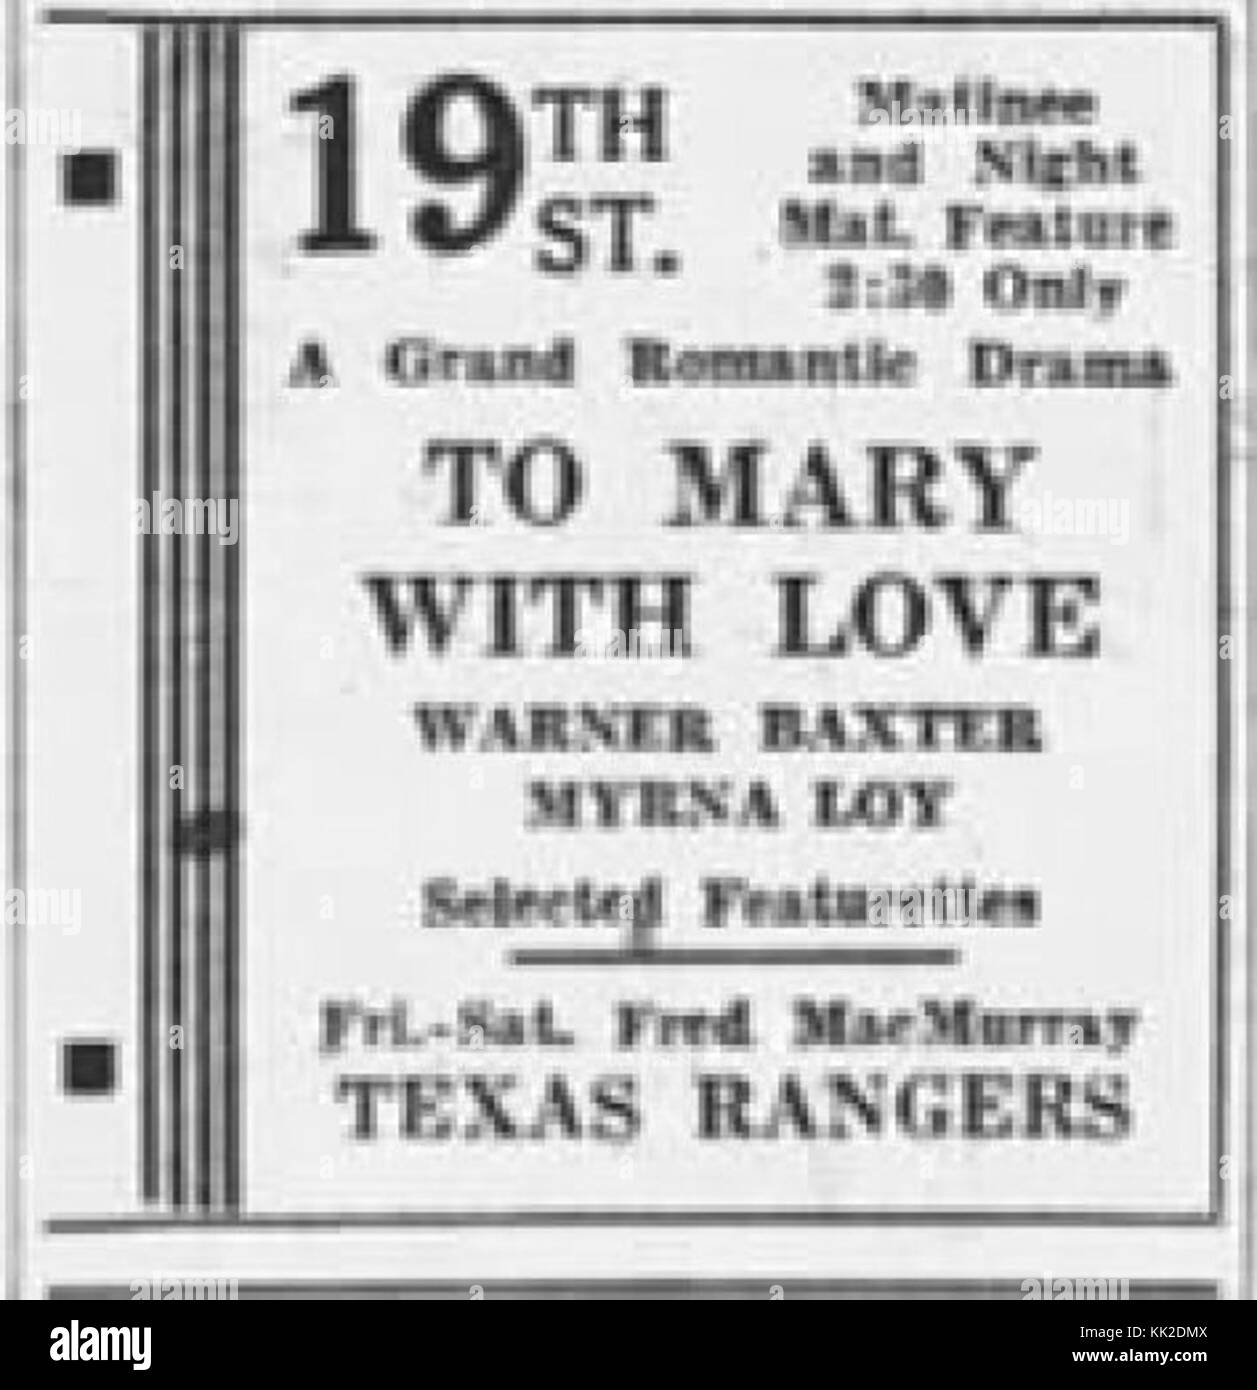 1936   Nineteenth Street Theater Ad   8 Oct MC   Allentown - Stock Image